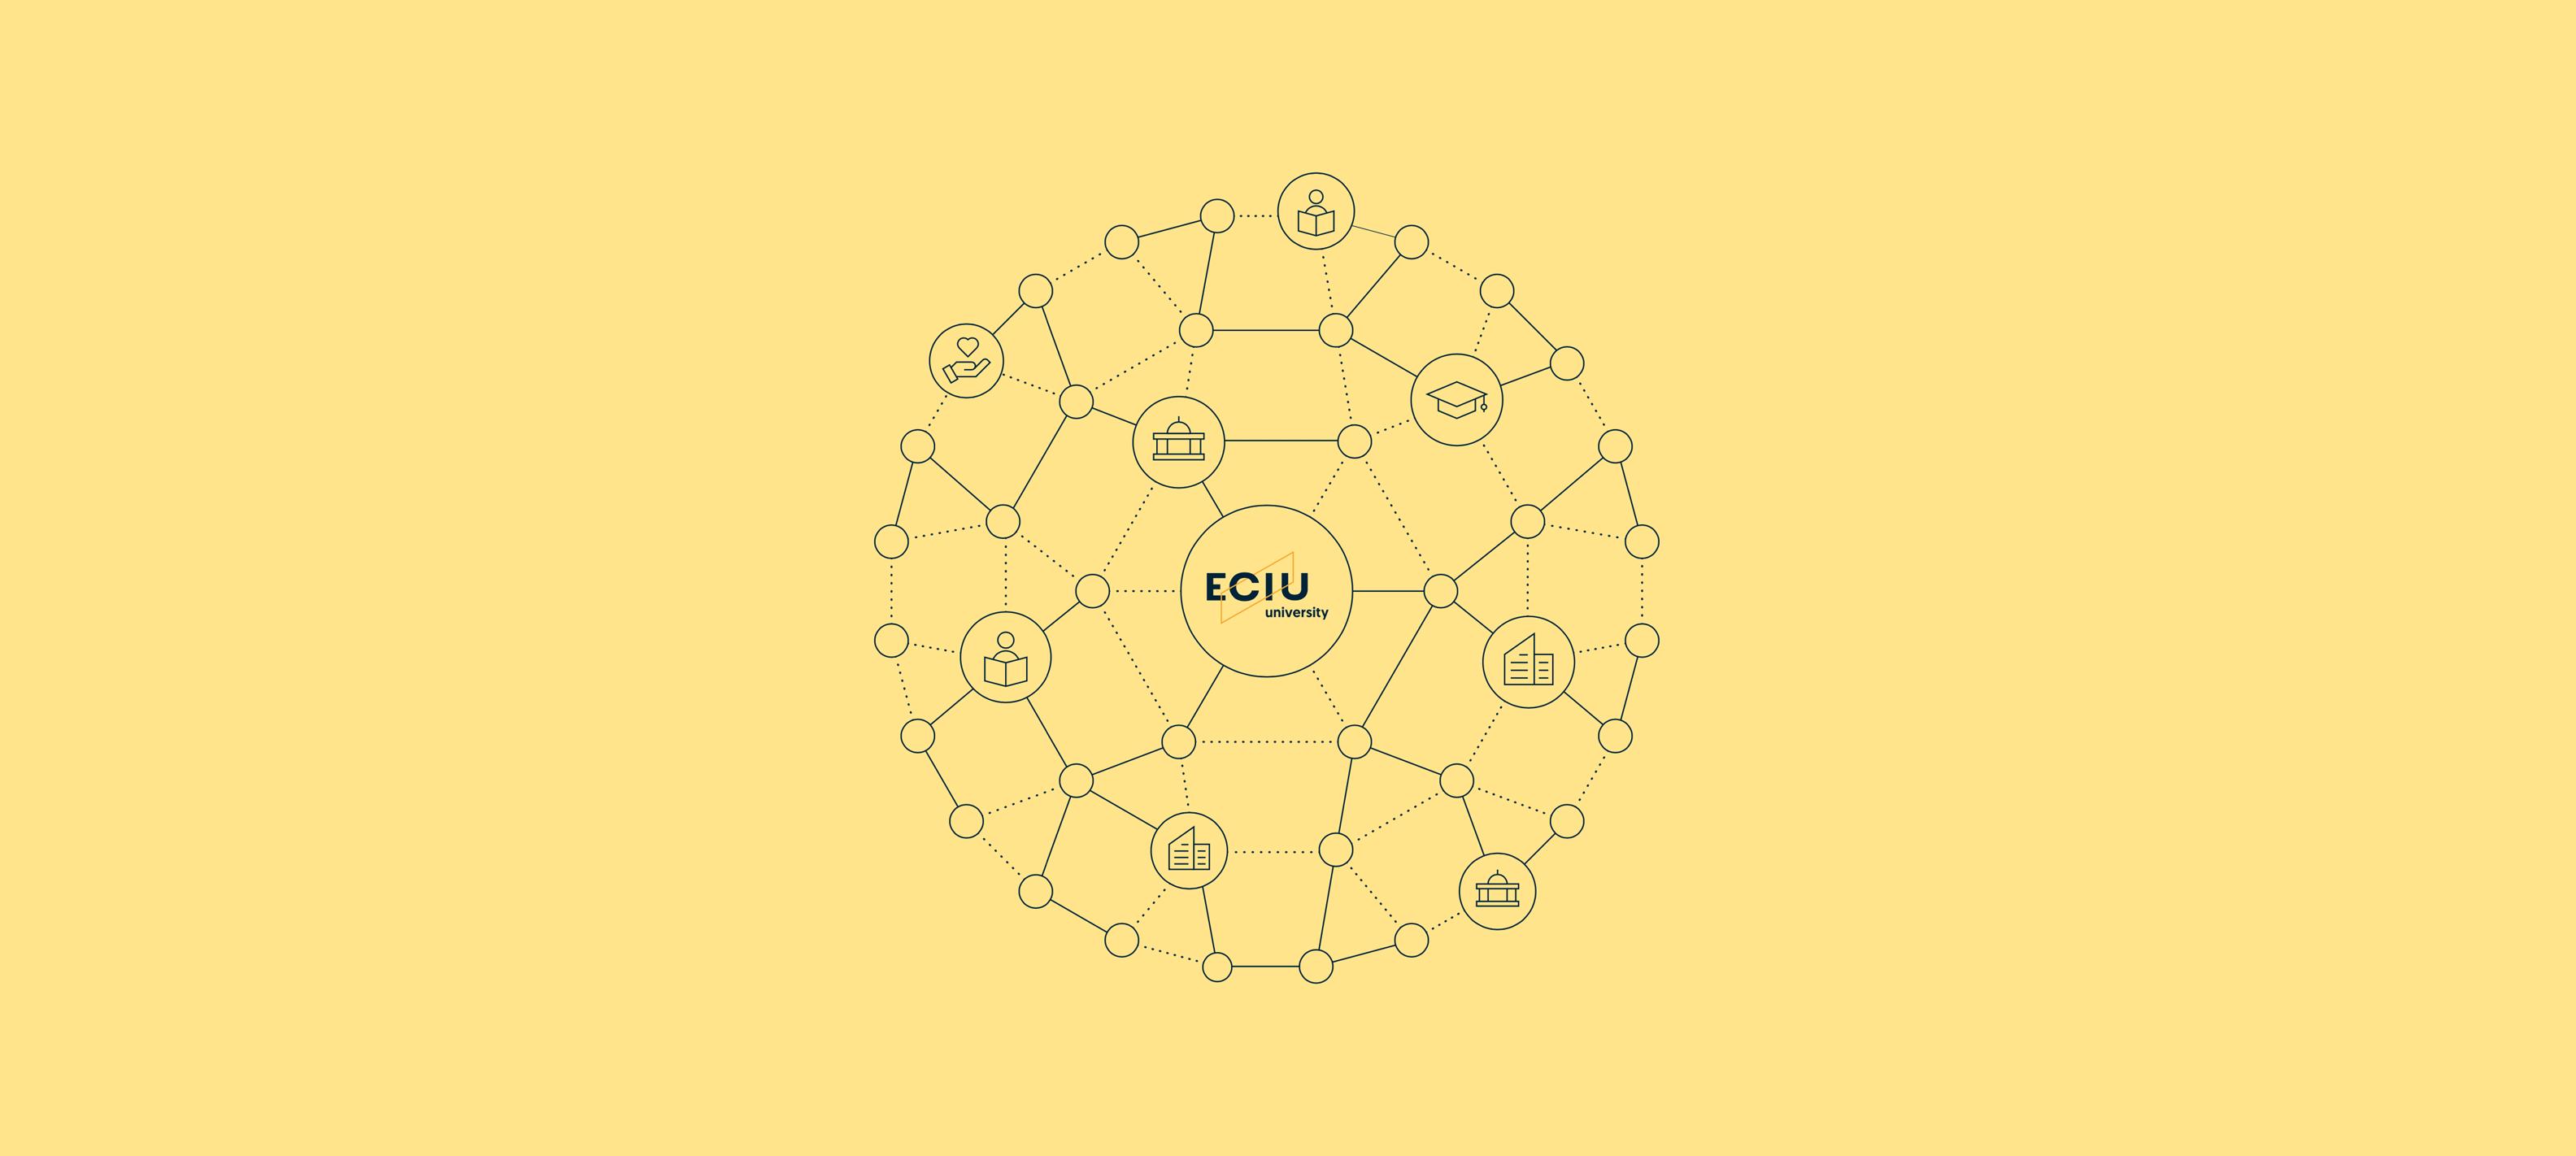 ECIU University 2030, Connects U for Life